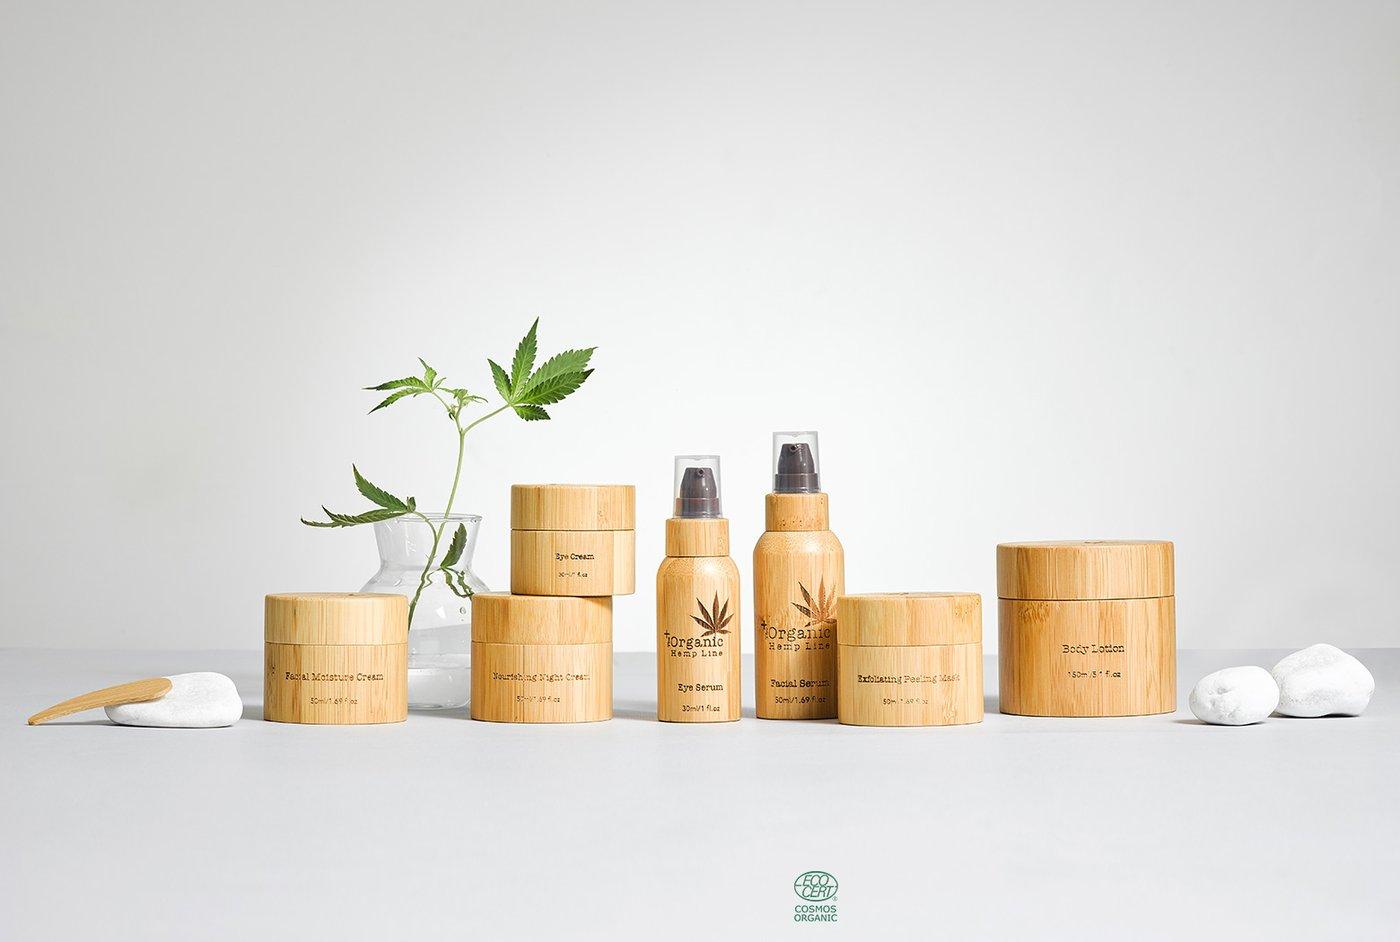 DISCOVER HEMP - Organic Products from Hemp